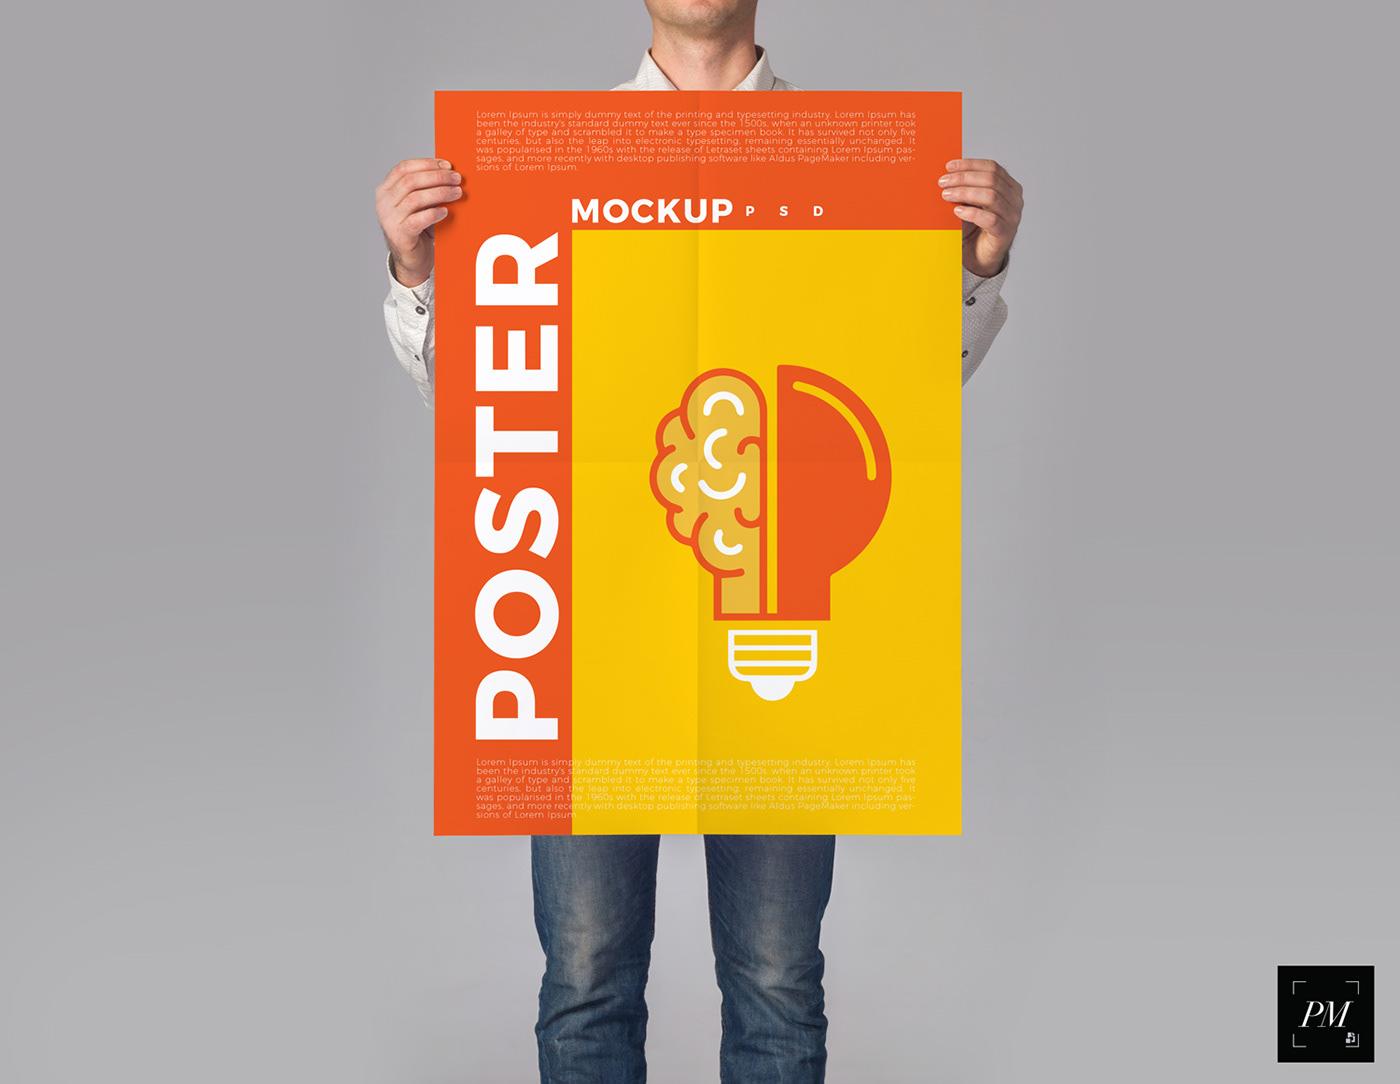 Poster Mockup Mockup free mockup  mockup free mockup psd freebie branding  graphic design  Advertising